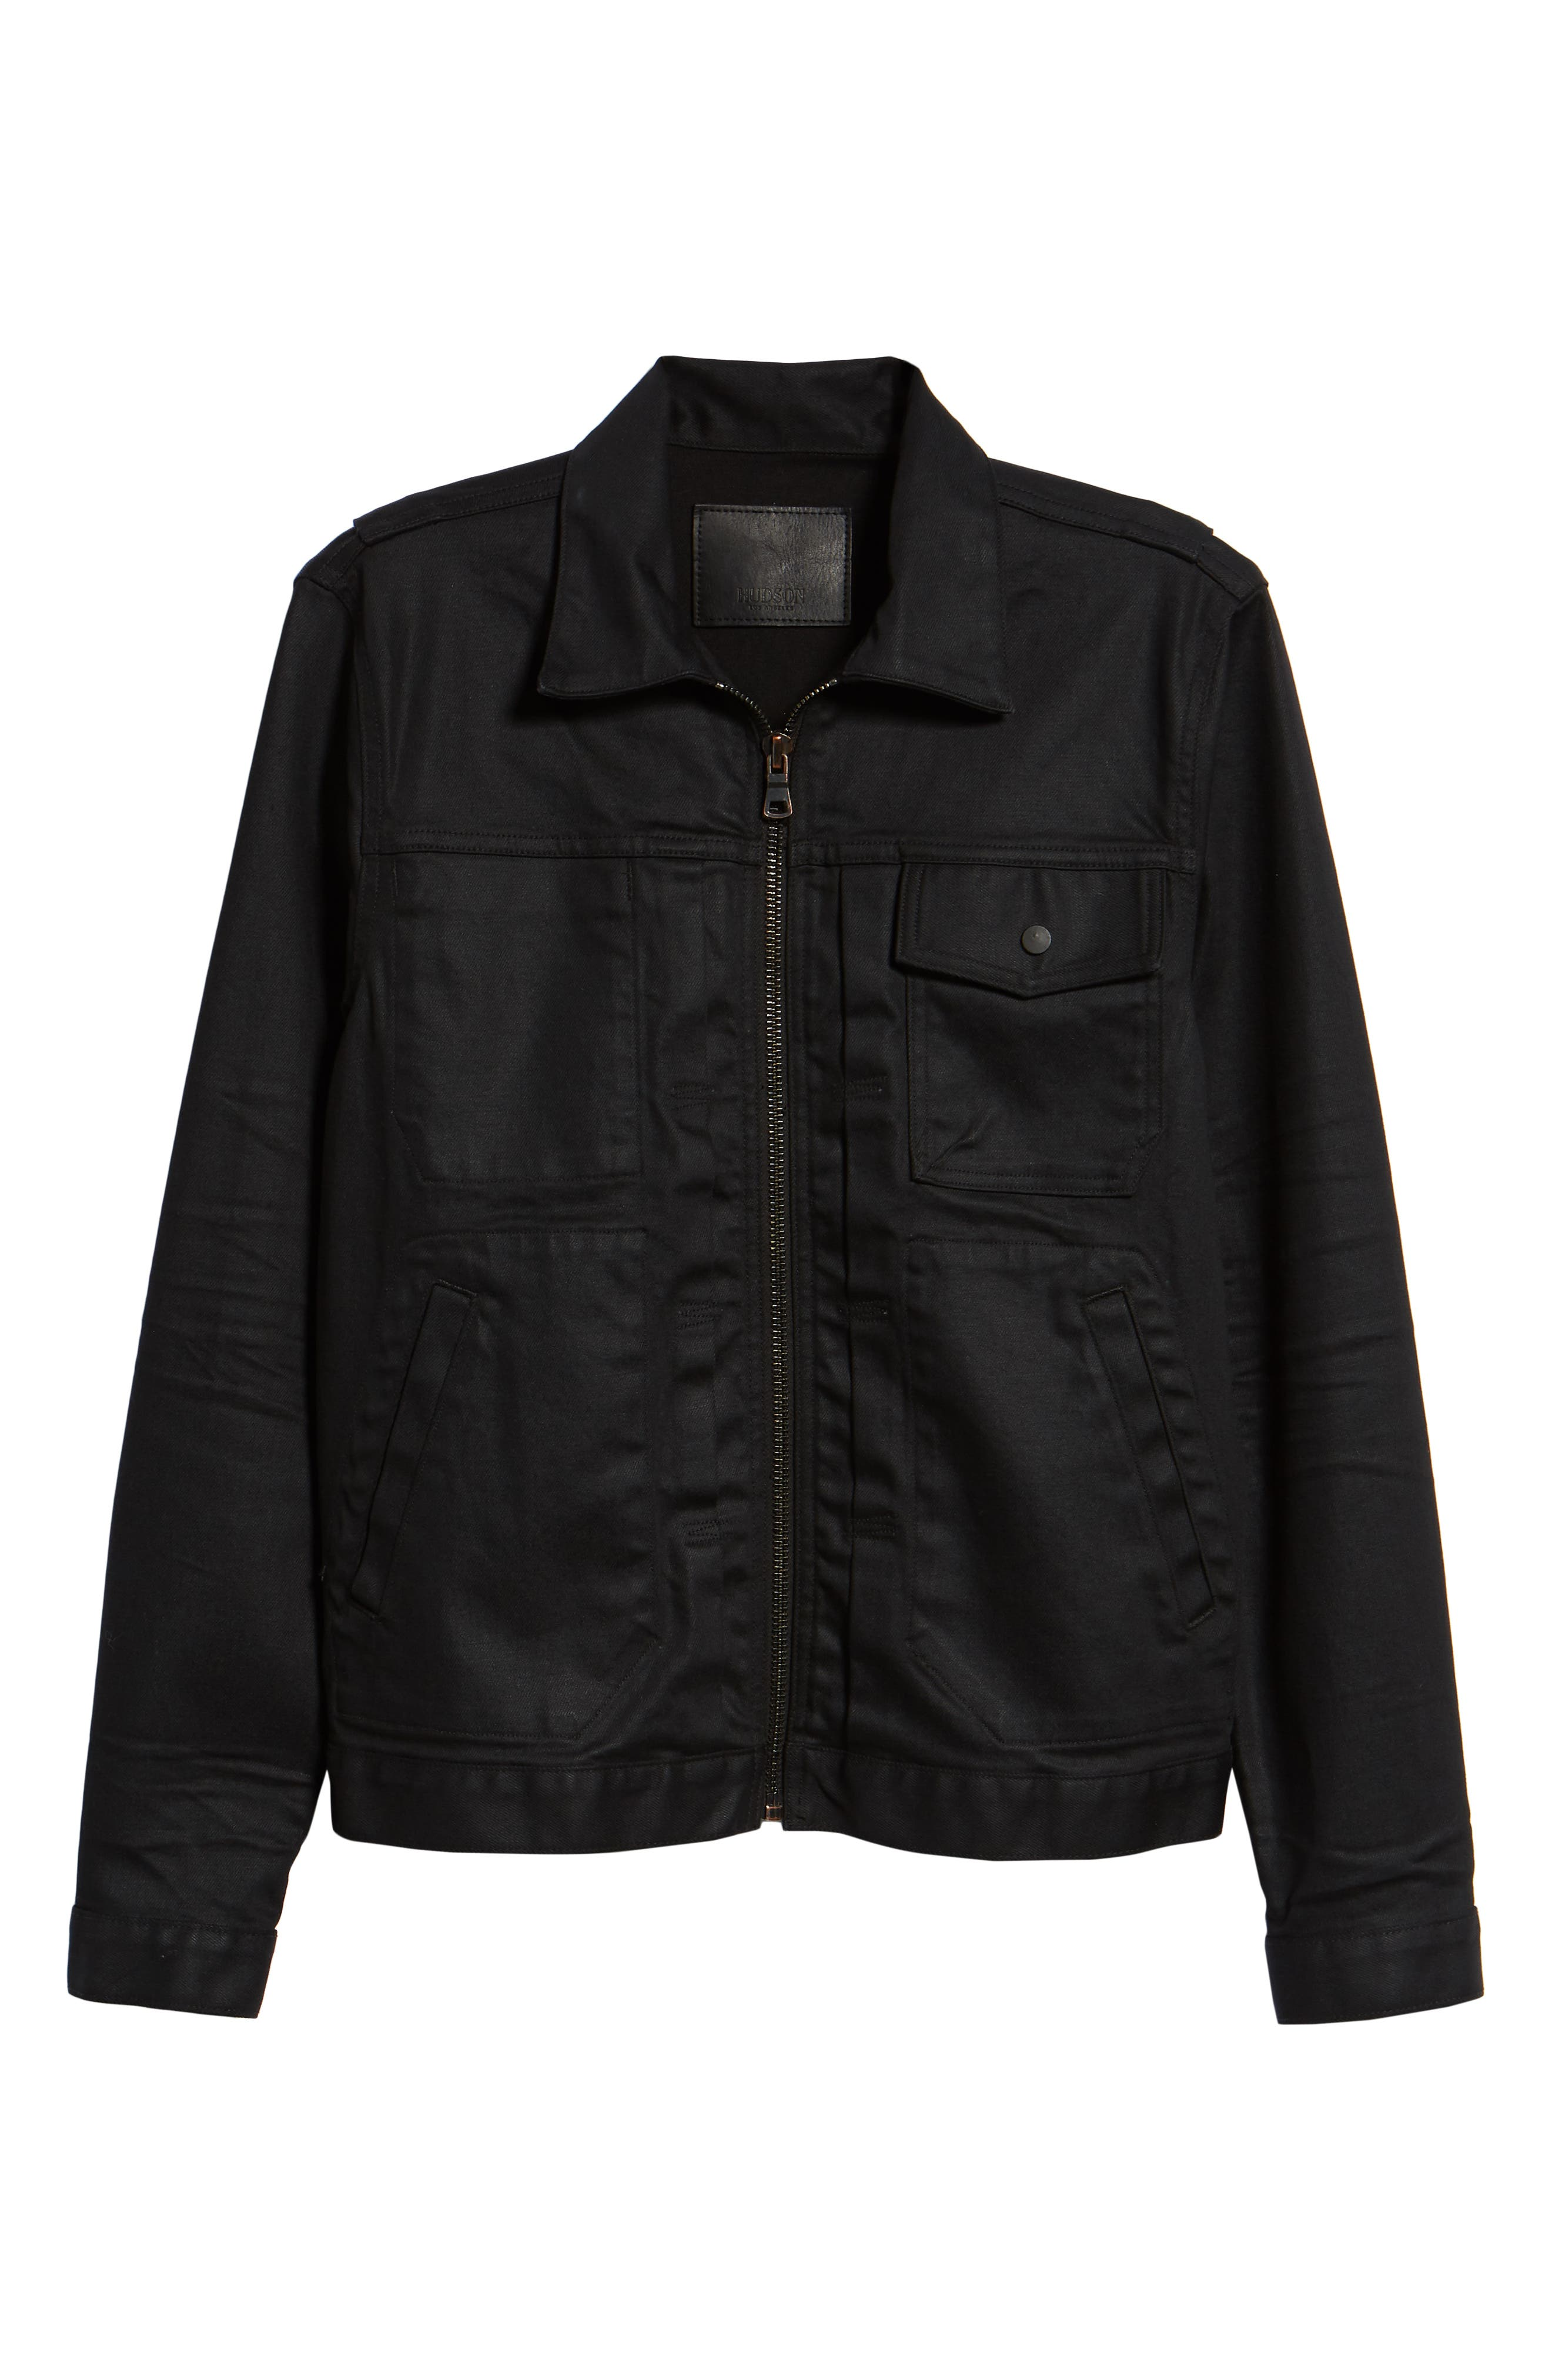 HUDSON JEANS, Zip Denim Jacket, Alternate thumbnail 5, color, ONYX